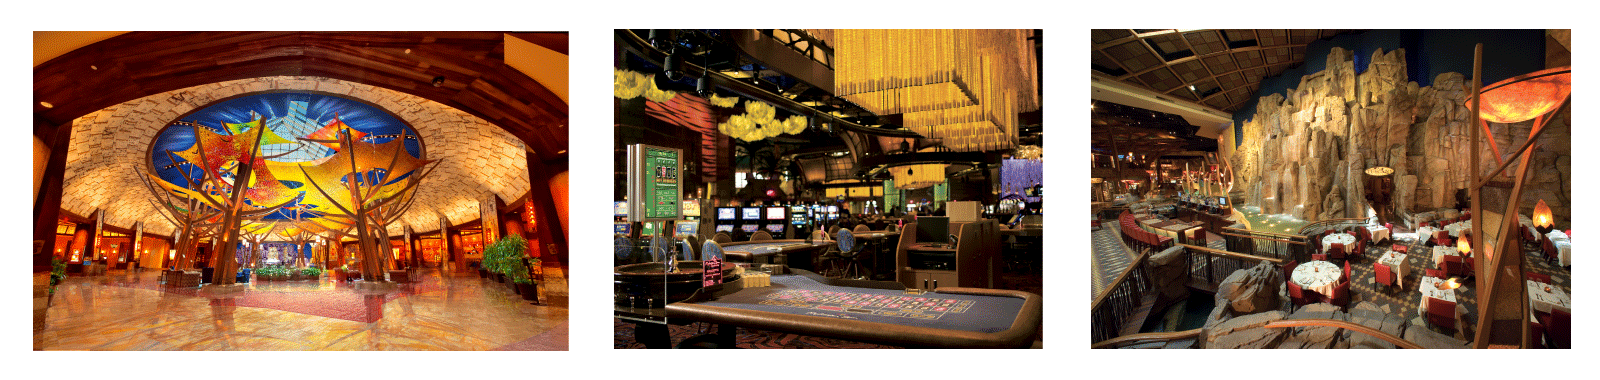 Ron Zoby Tours - Premier Independent Casino Marketing Representatives for your Mohegan Junket Tour